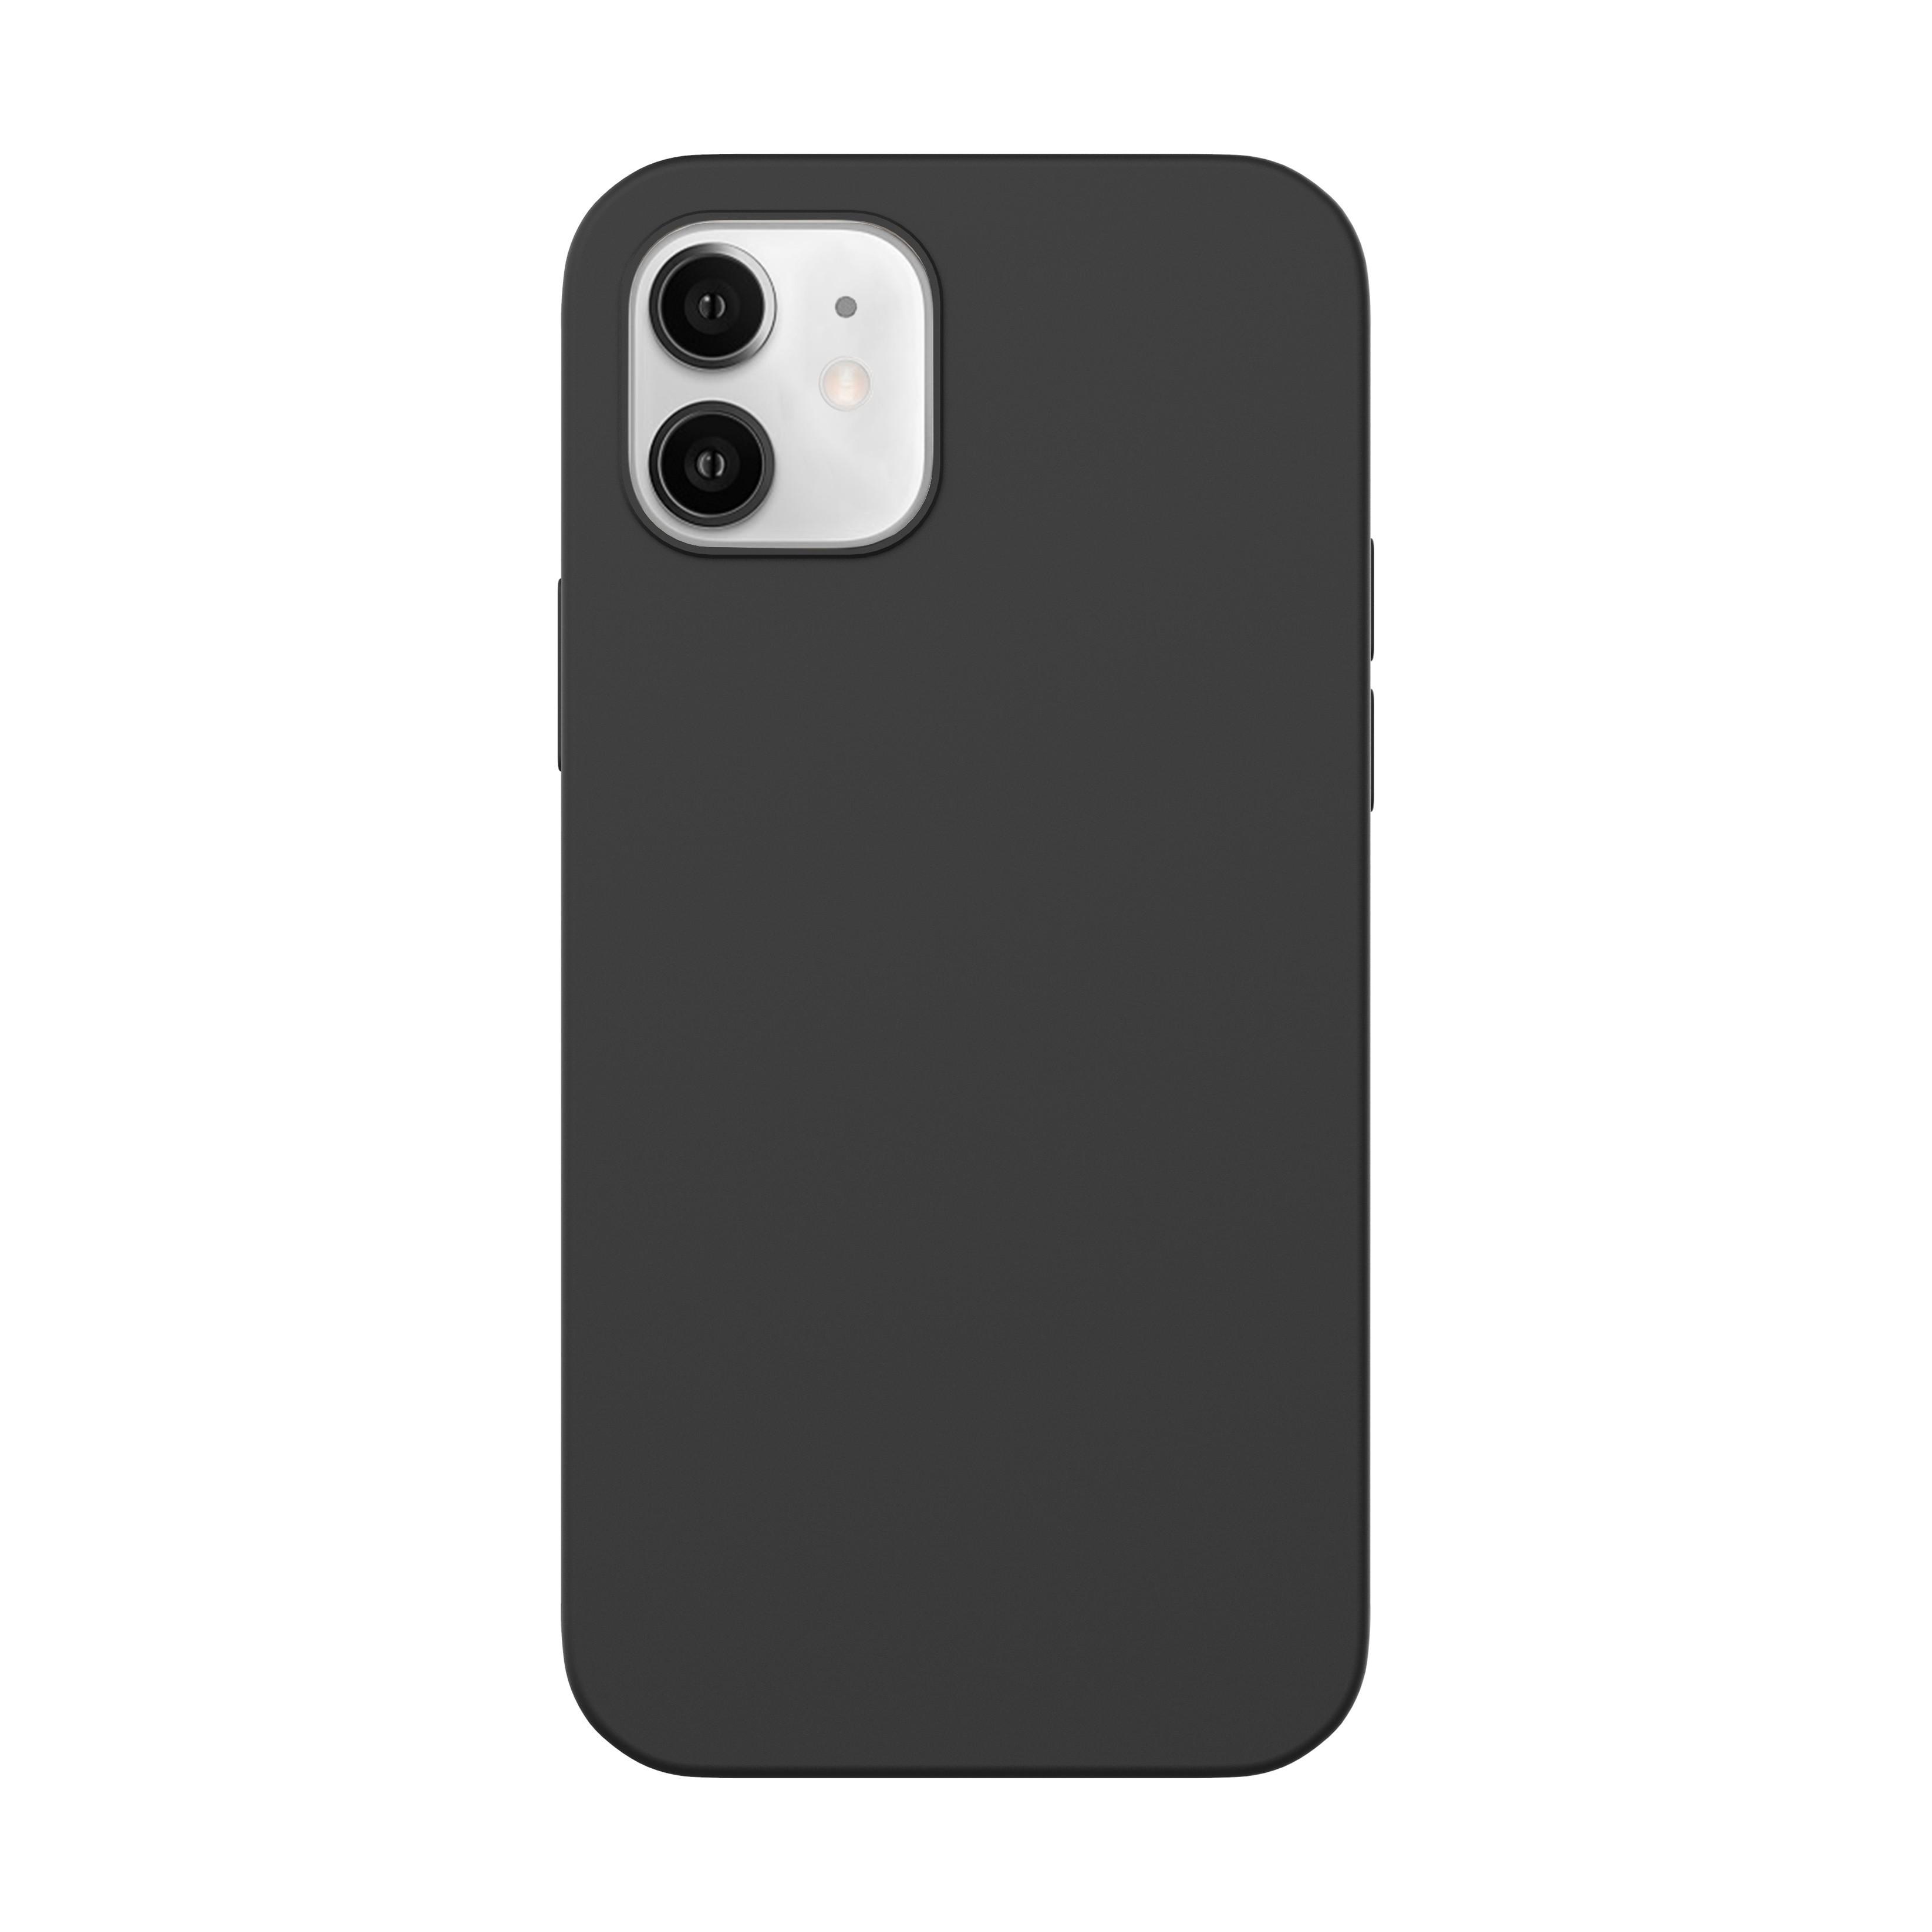 Capac protectie spate cellara din silicon colectia slim pentru iphone 12 mini - negru